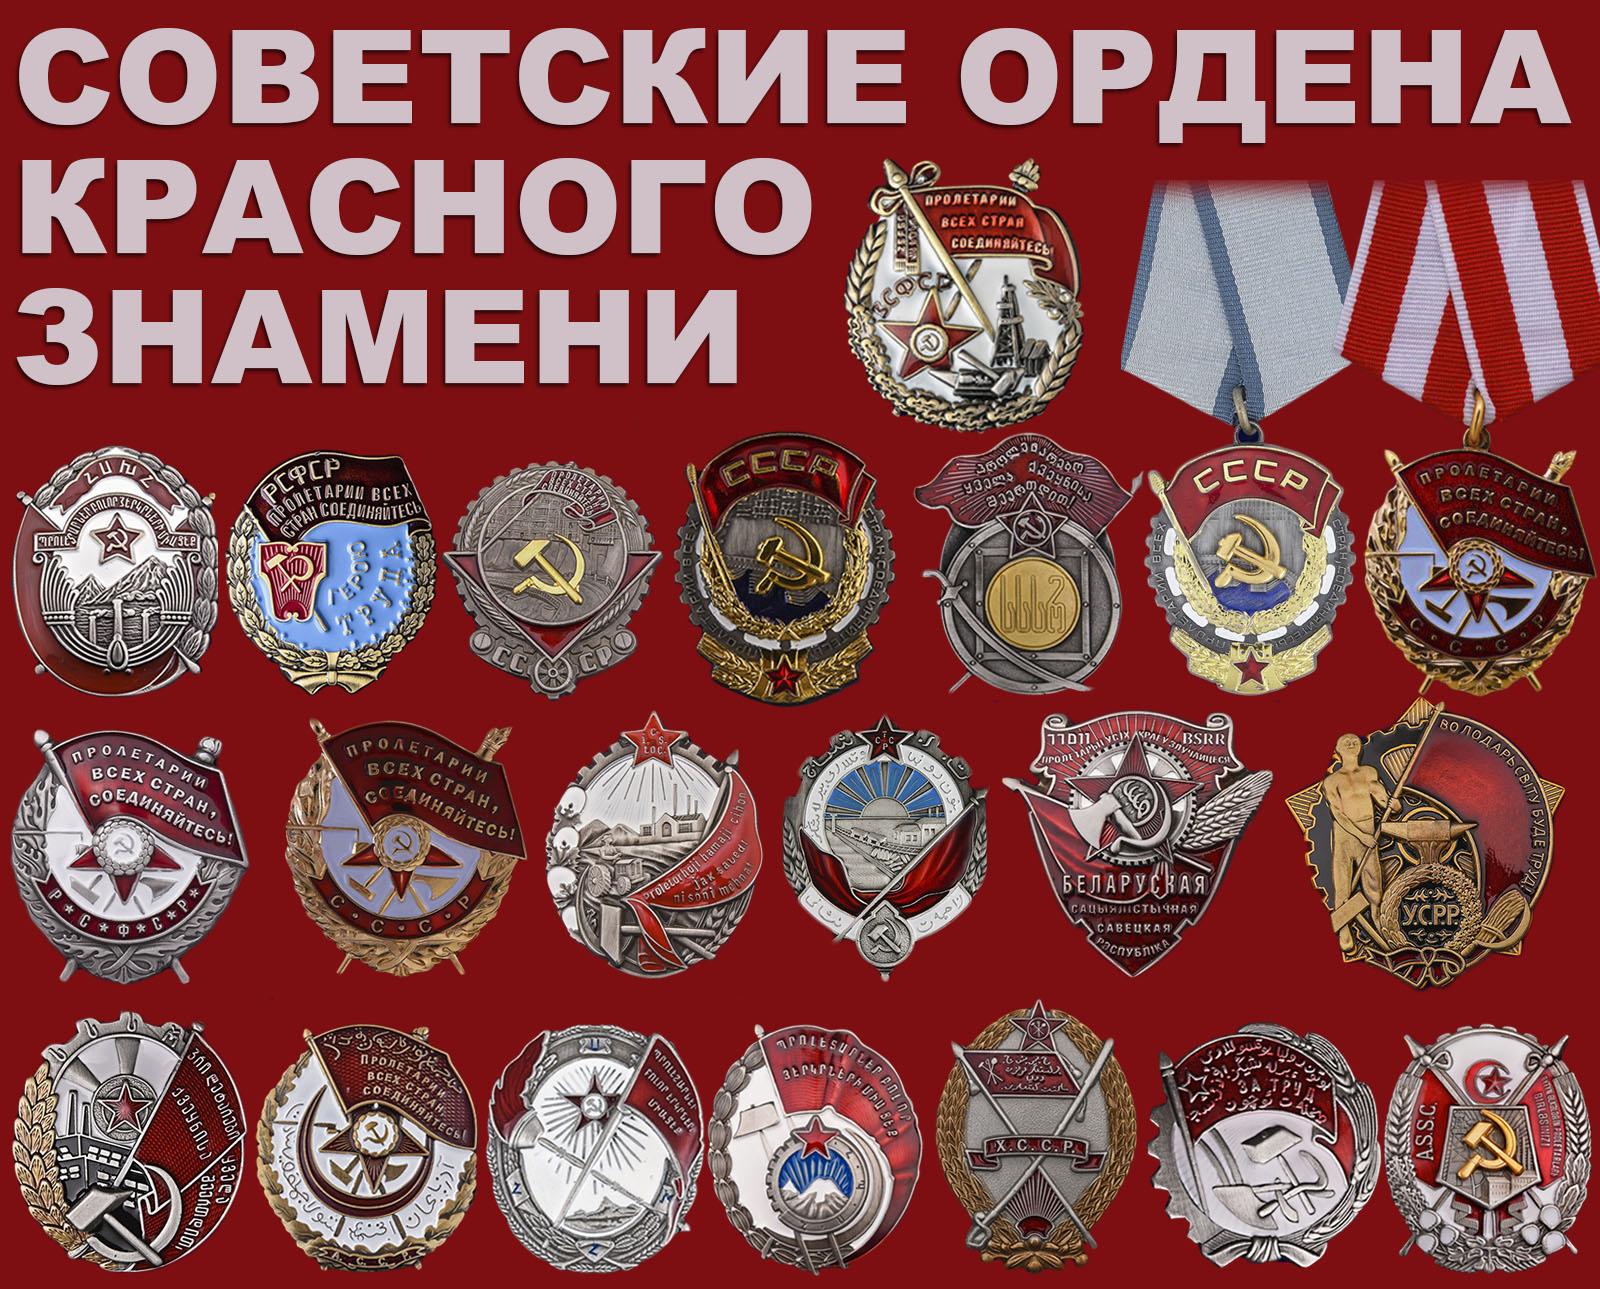 Советские ордена Красного Знамени